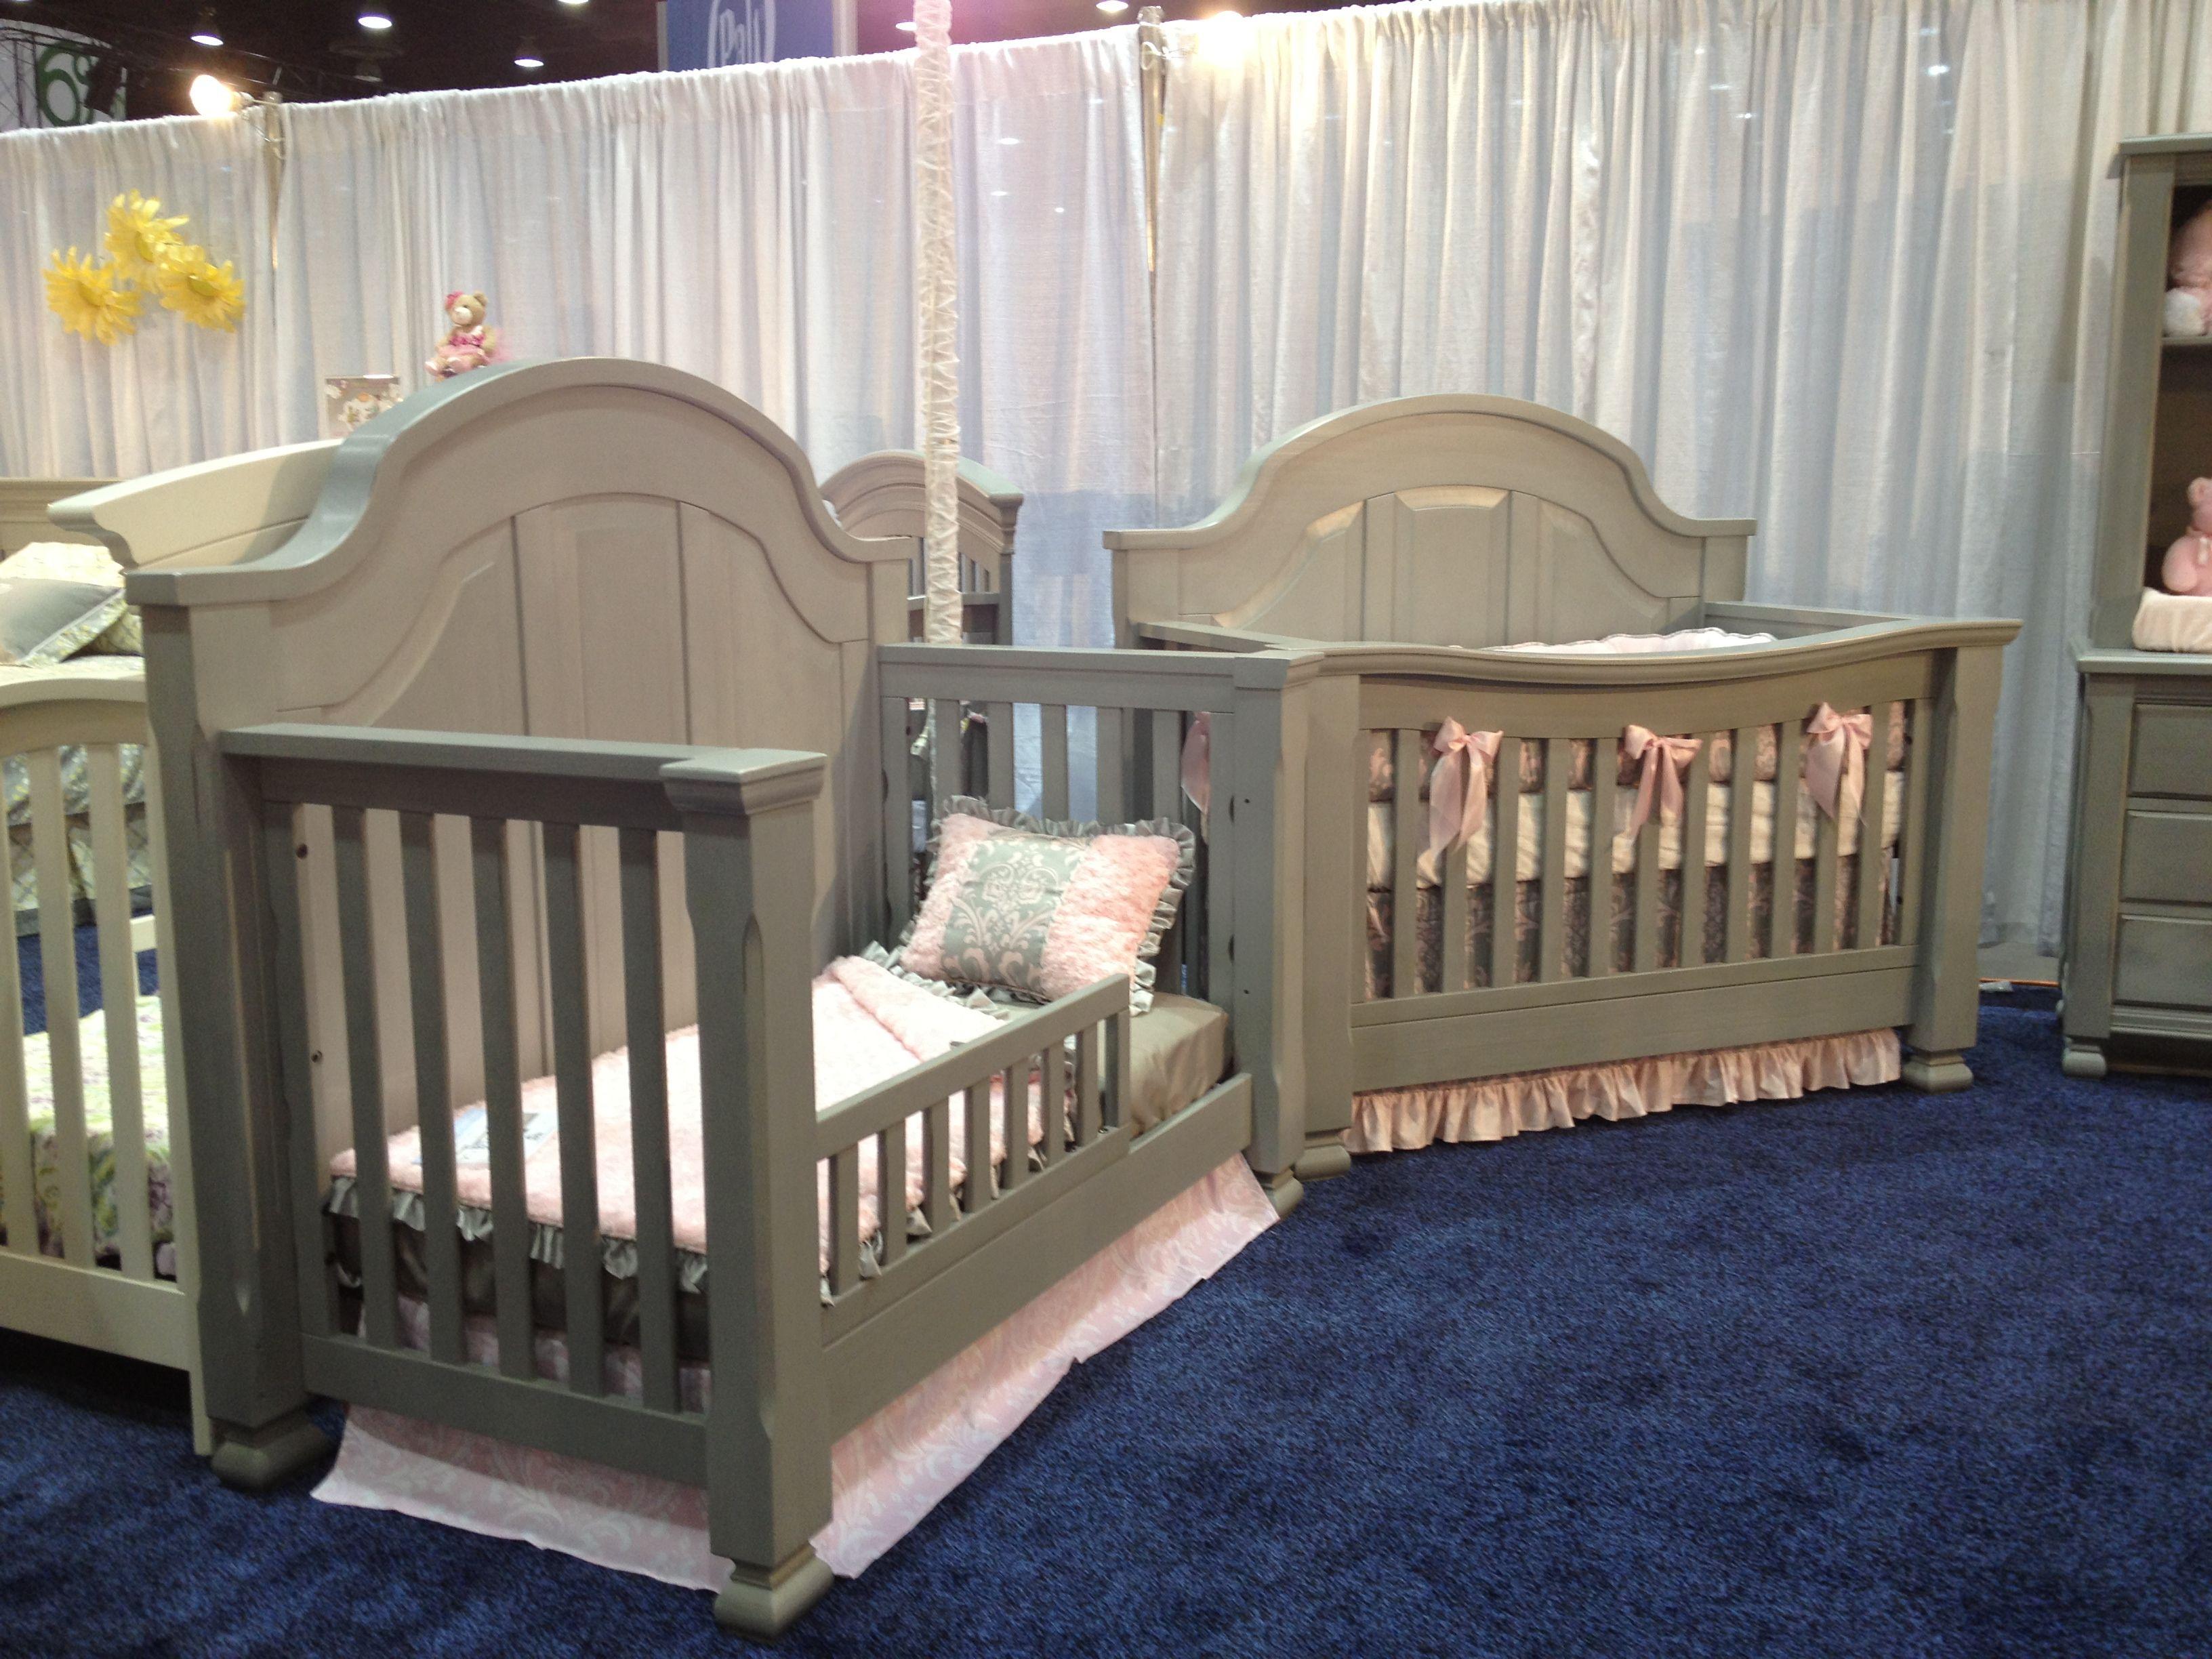 rory hei wid s cribs espresso prod p qlt crib convertible dream graco baby in